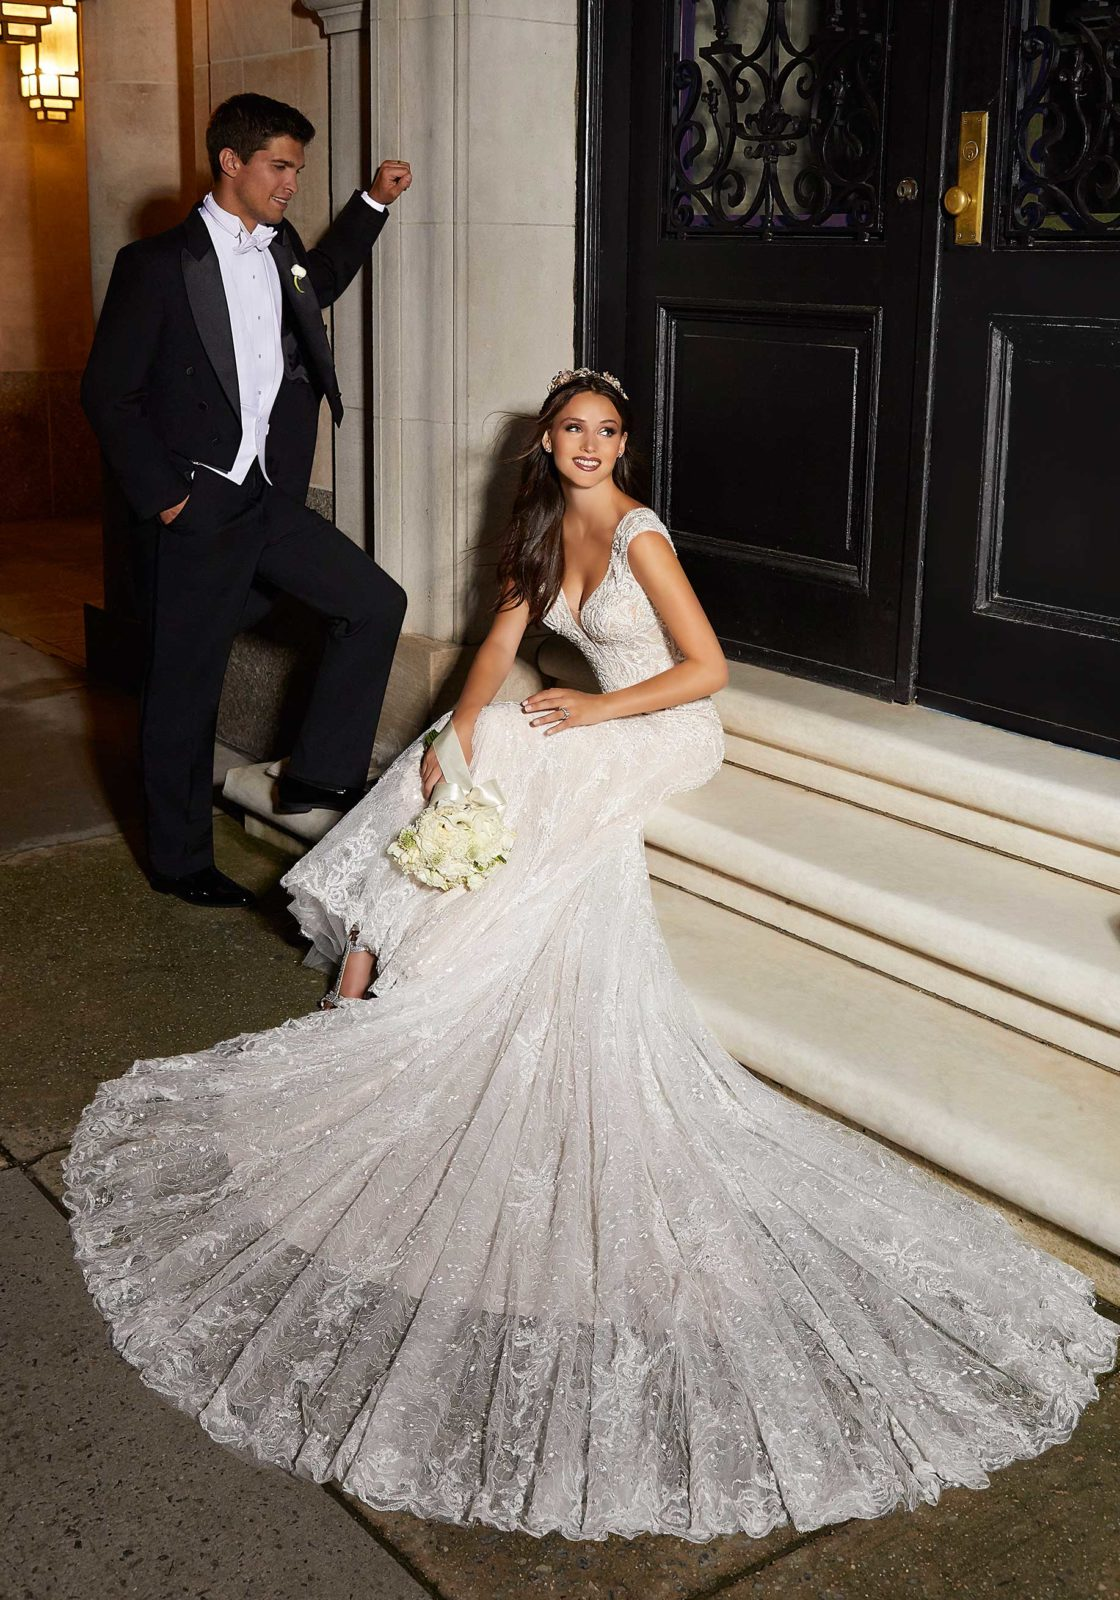 Designer: Morilee - Madiline Gardner Signature Collection - Sienna Wedding Dress - 1020